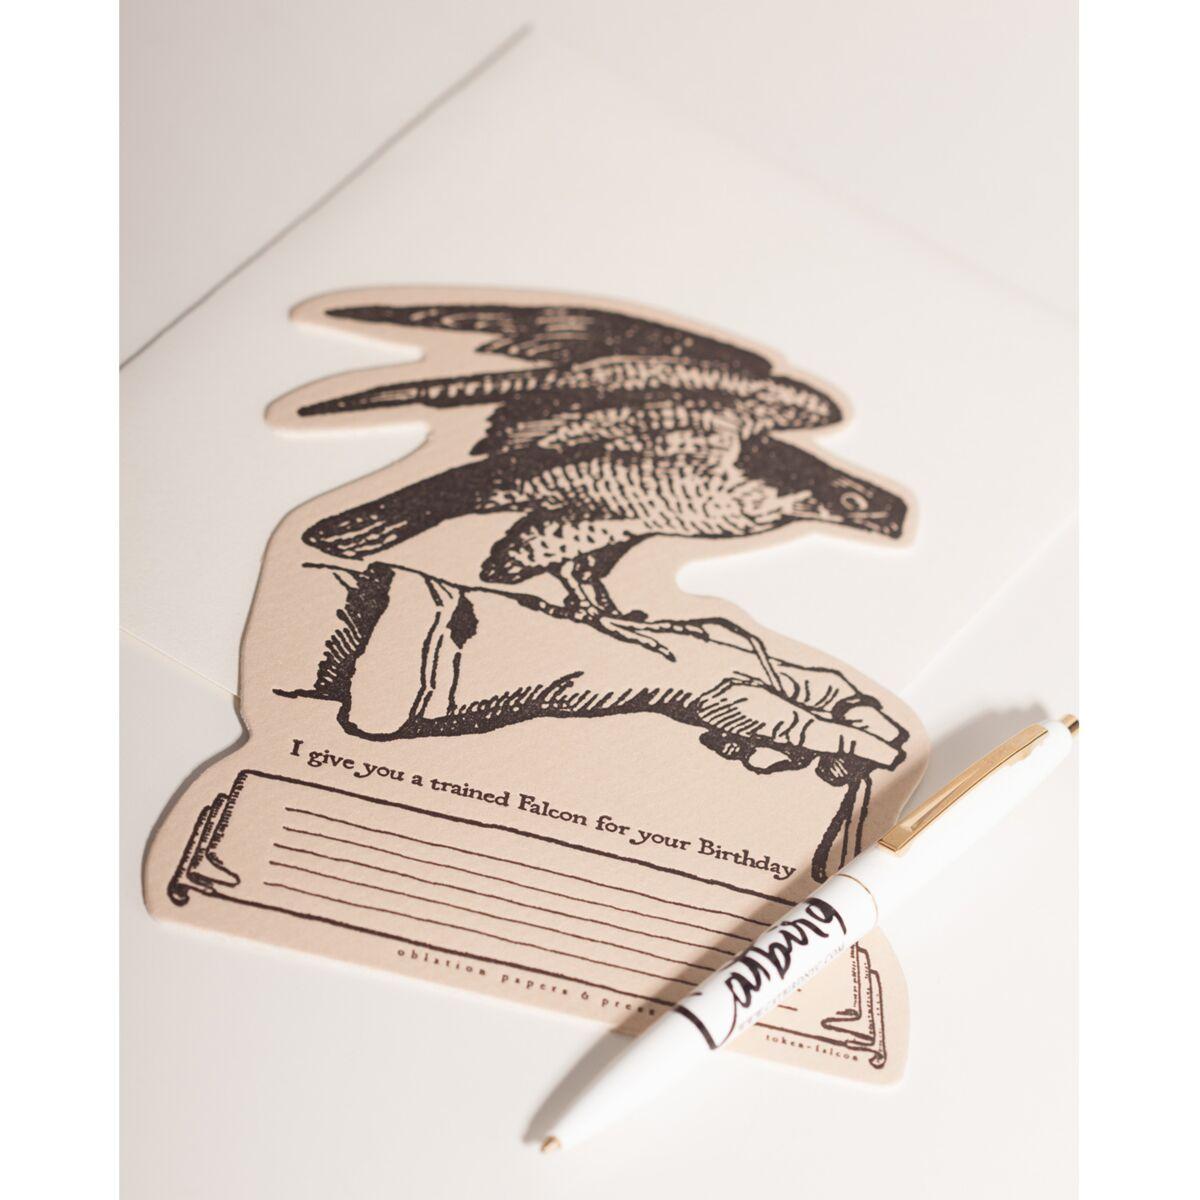 I Give You A Trained Falcon Card image